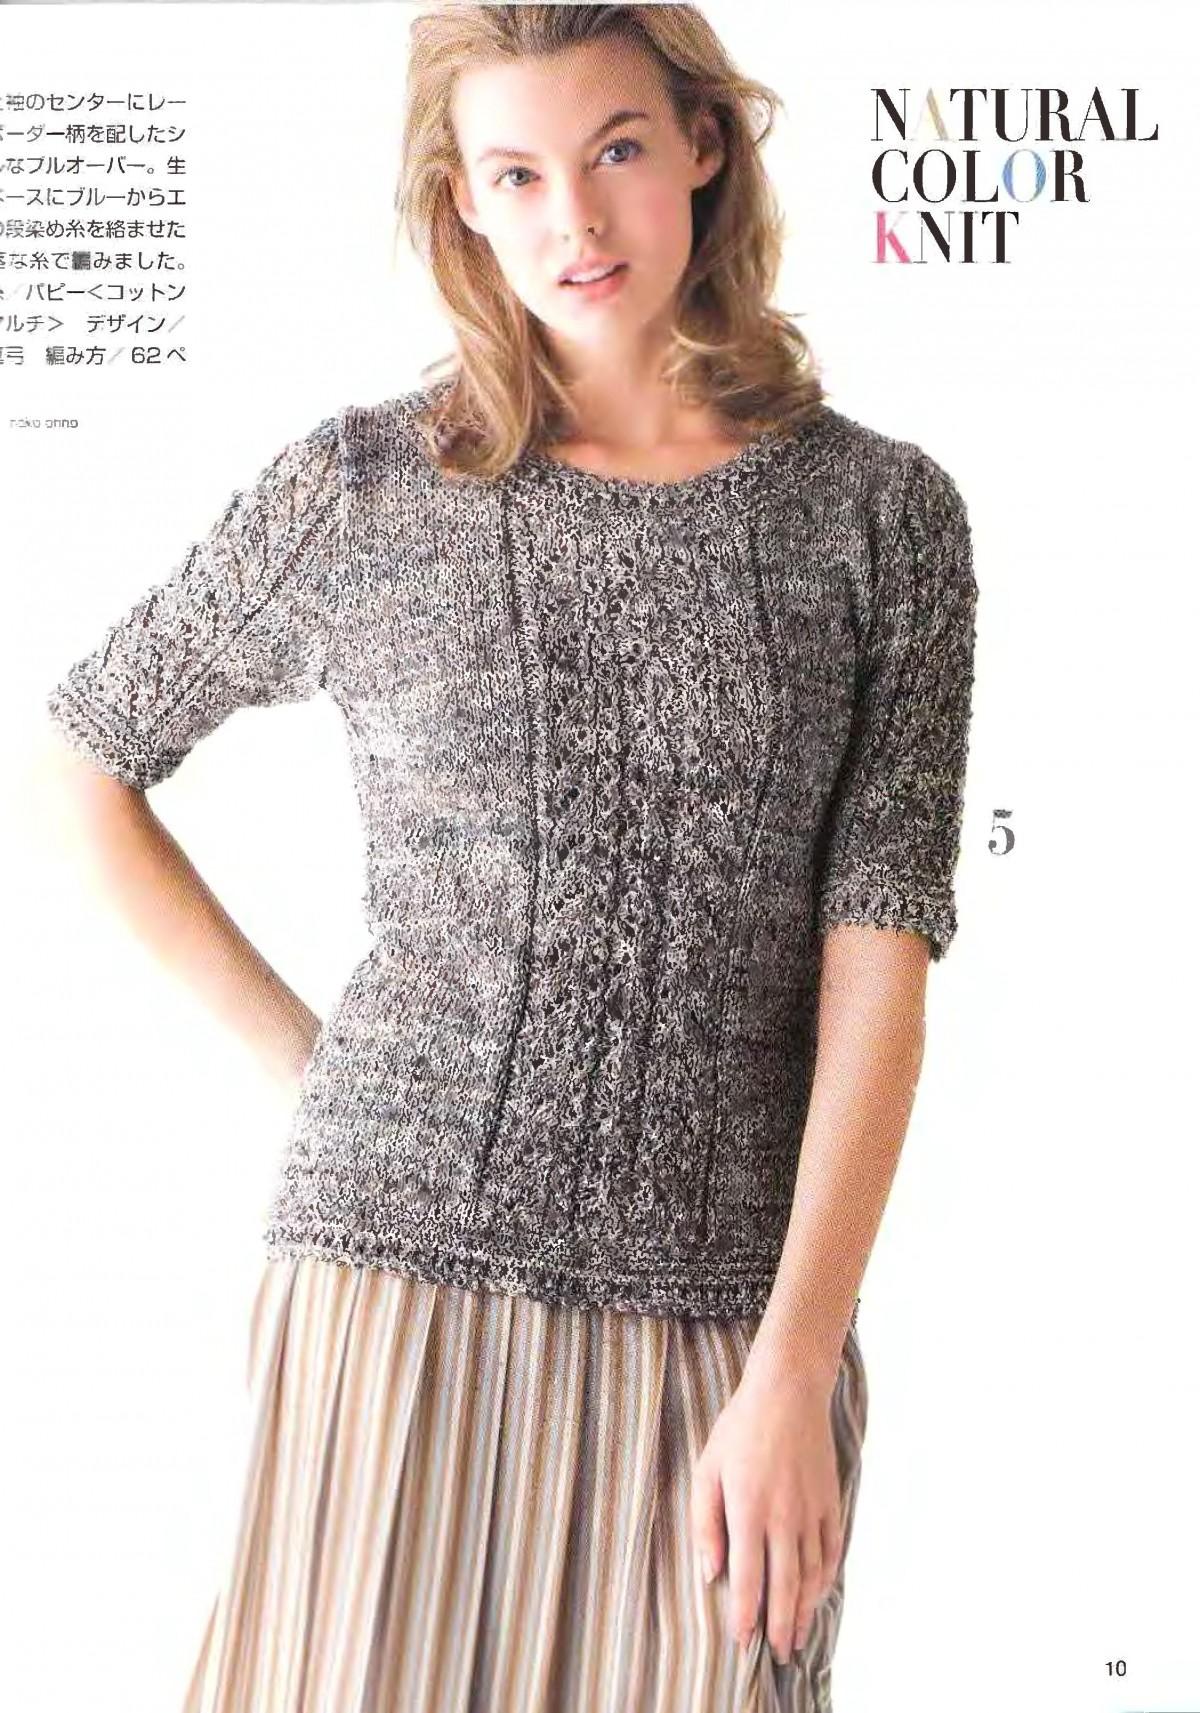 Lets-knit-series-NV4359-2008-Spring-Summer-sp-kr_8.jpg